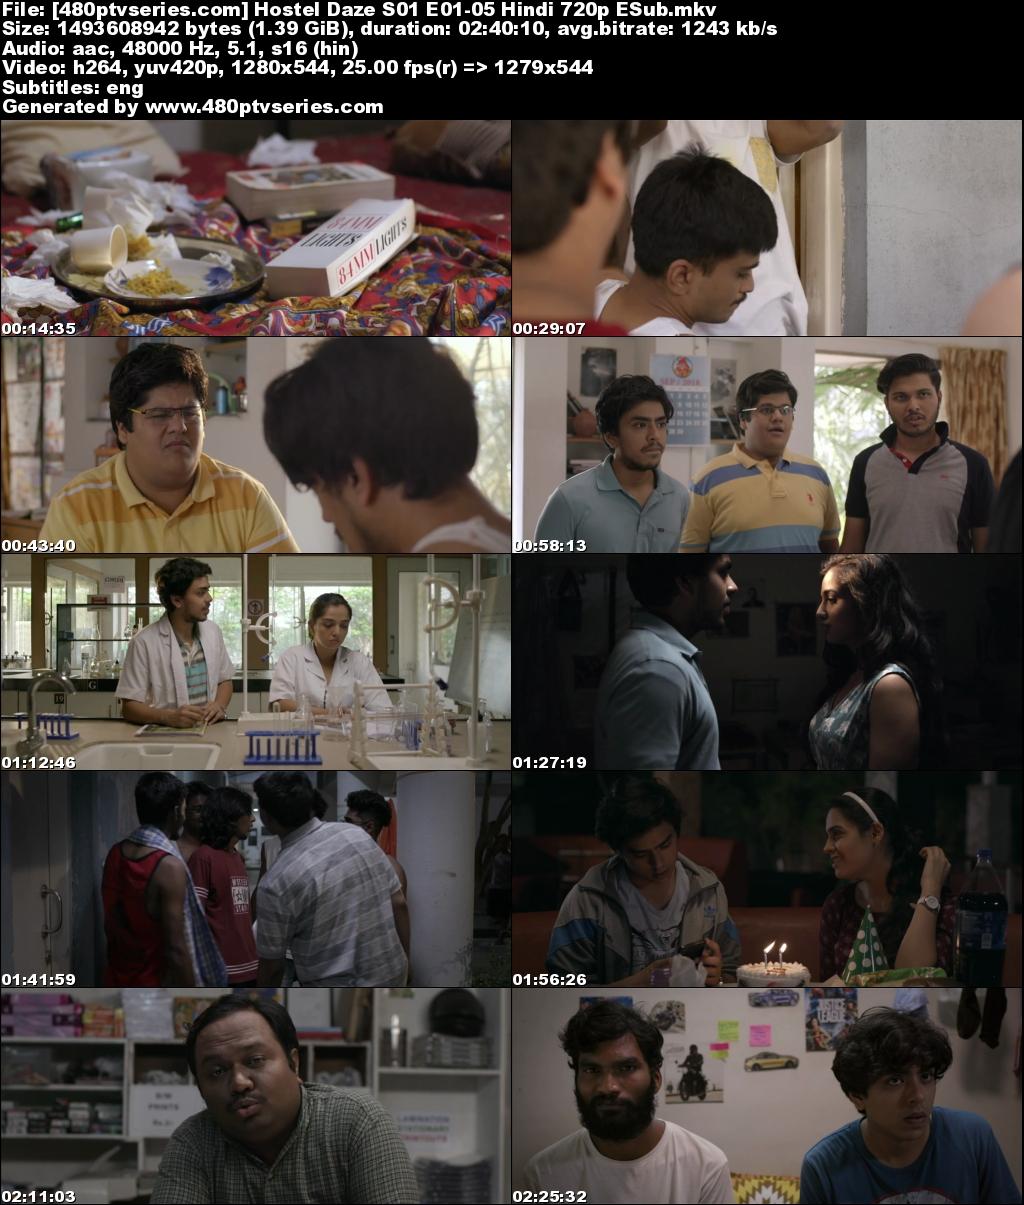 Watch Online Free Hostel Daze Season 1 Full Hindi Download 480p 720p All Episodes